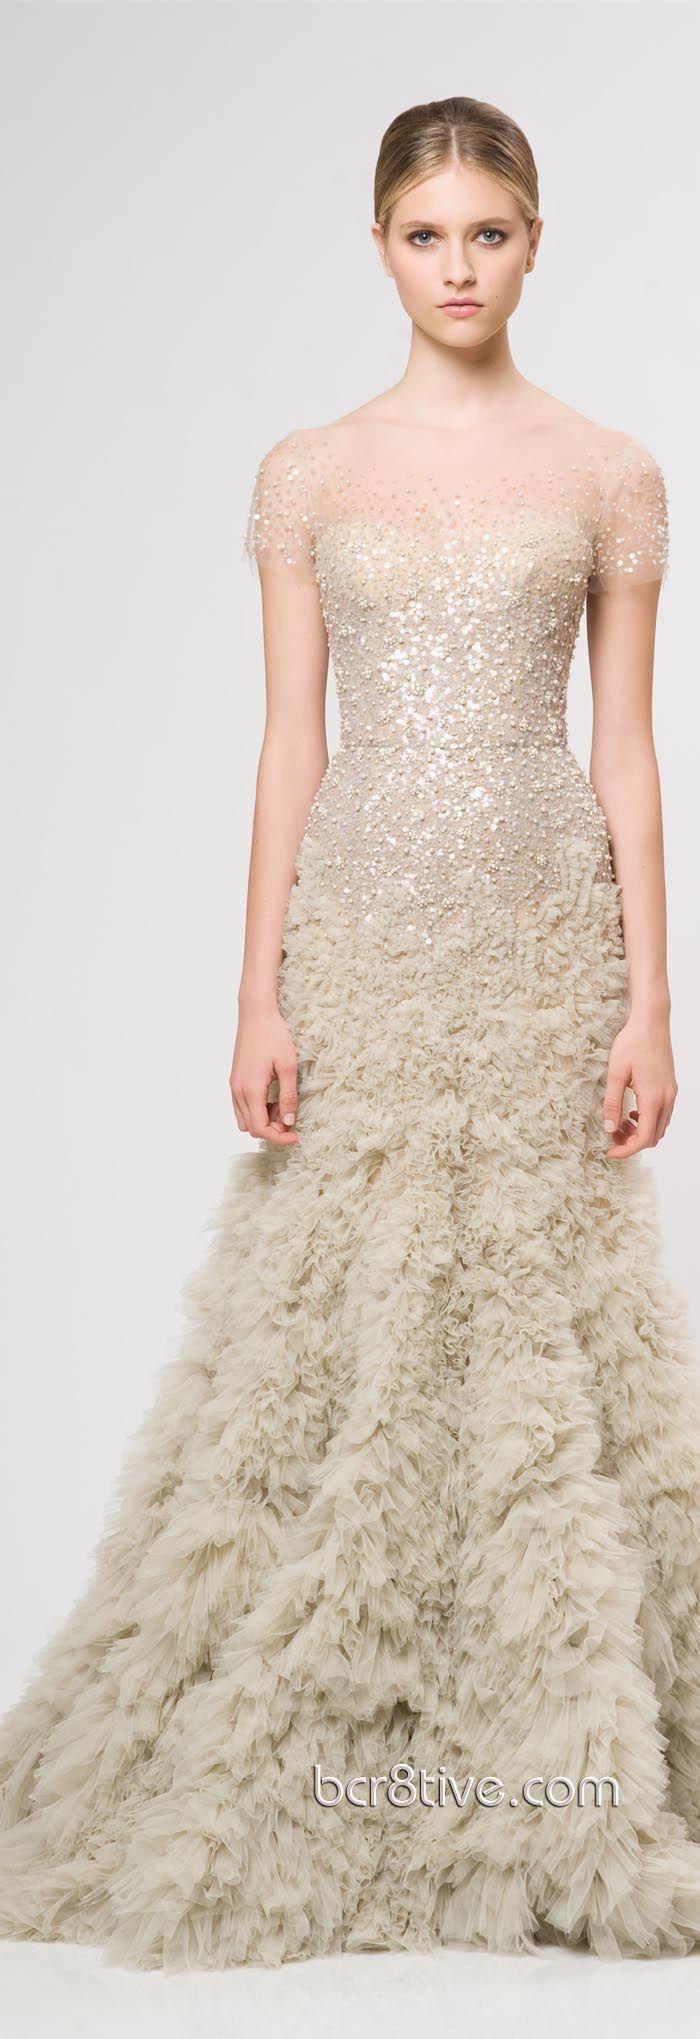 48 best Reem Acra bridal images on Pinterest | Wedding frocks ...